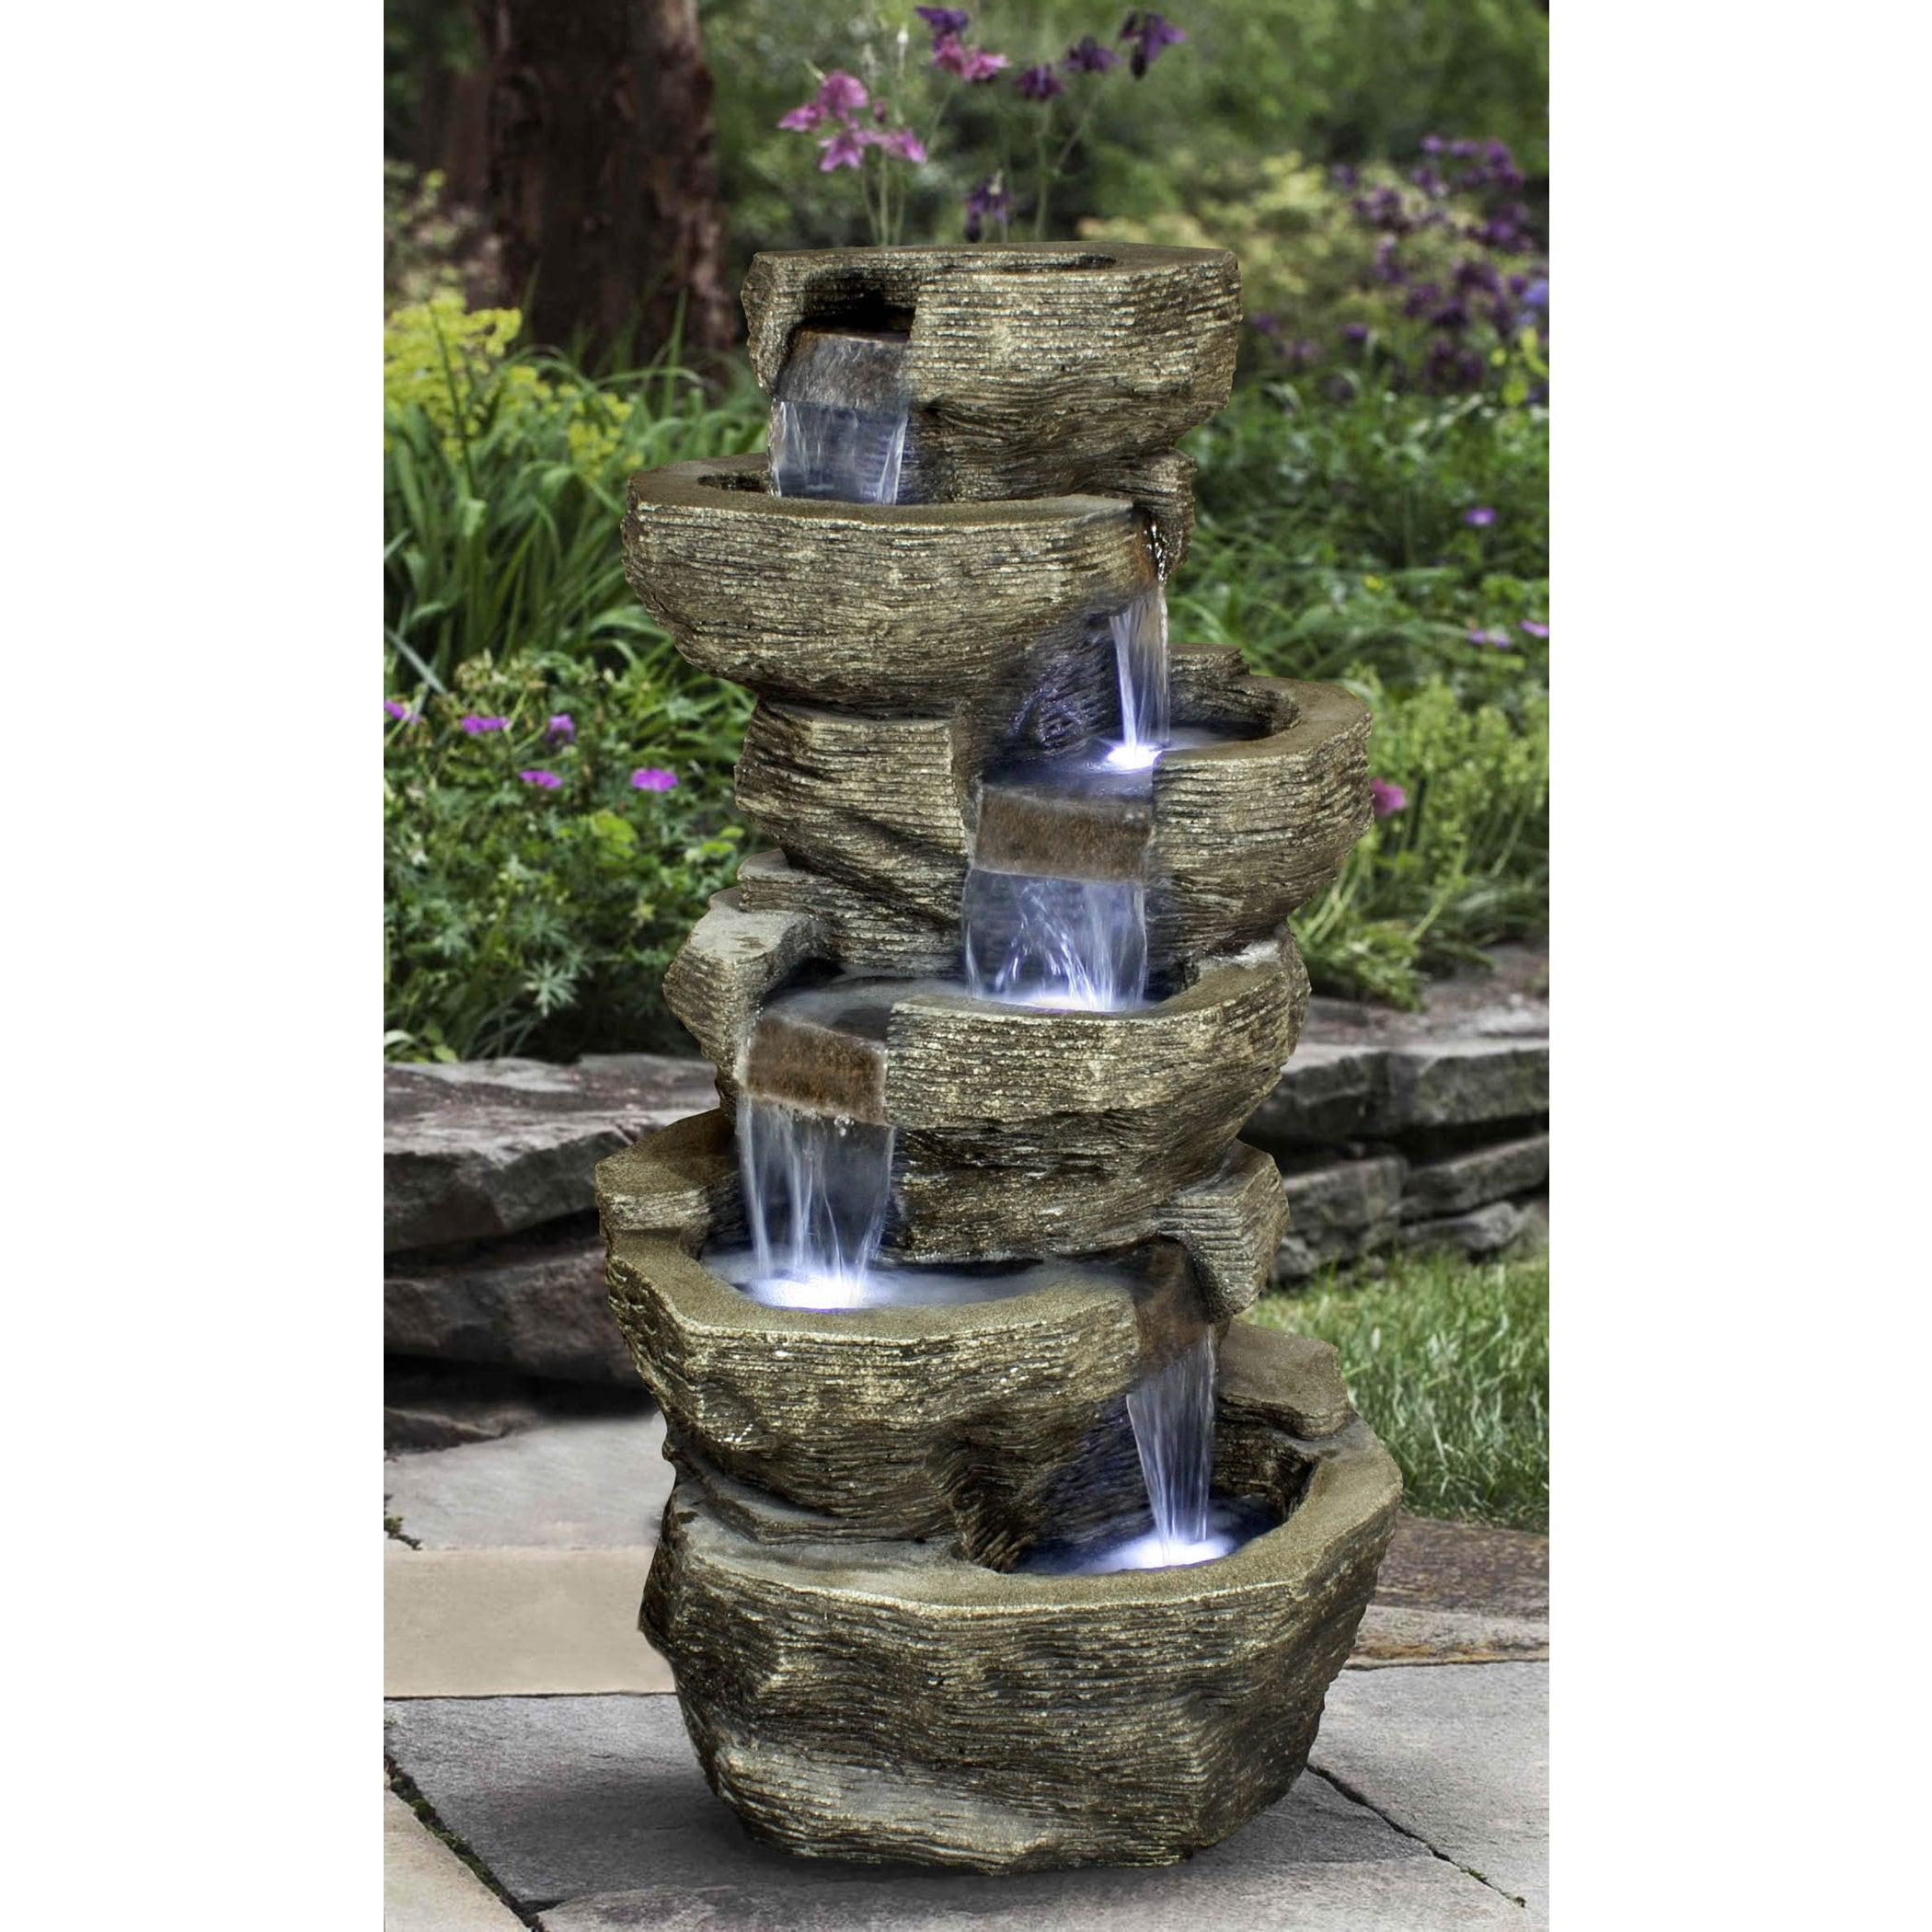 Zenvida Outdoor Tiered Rock Waterfall 39 inch Garden Fountain